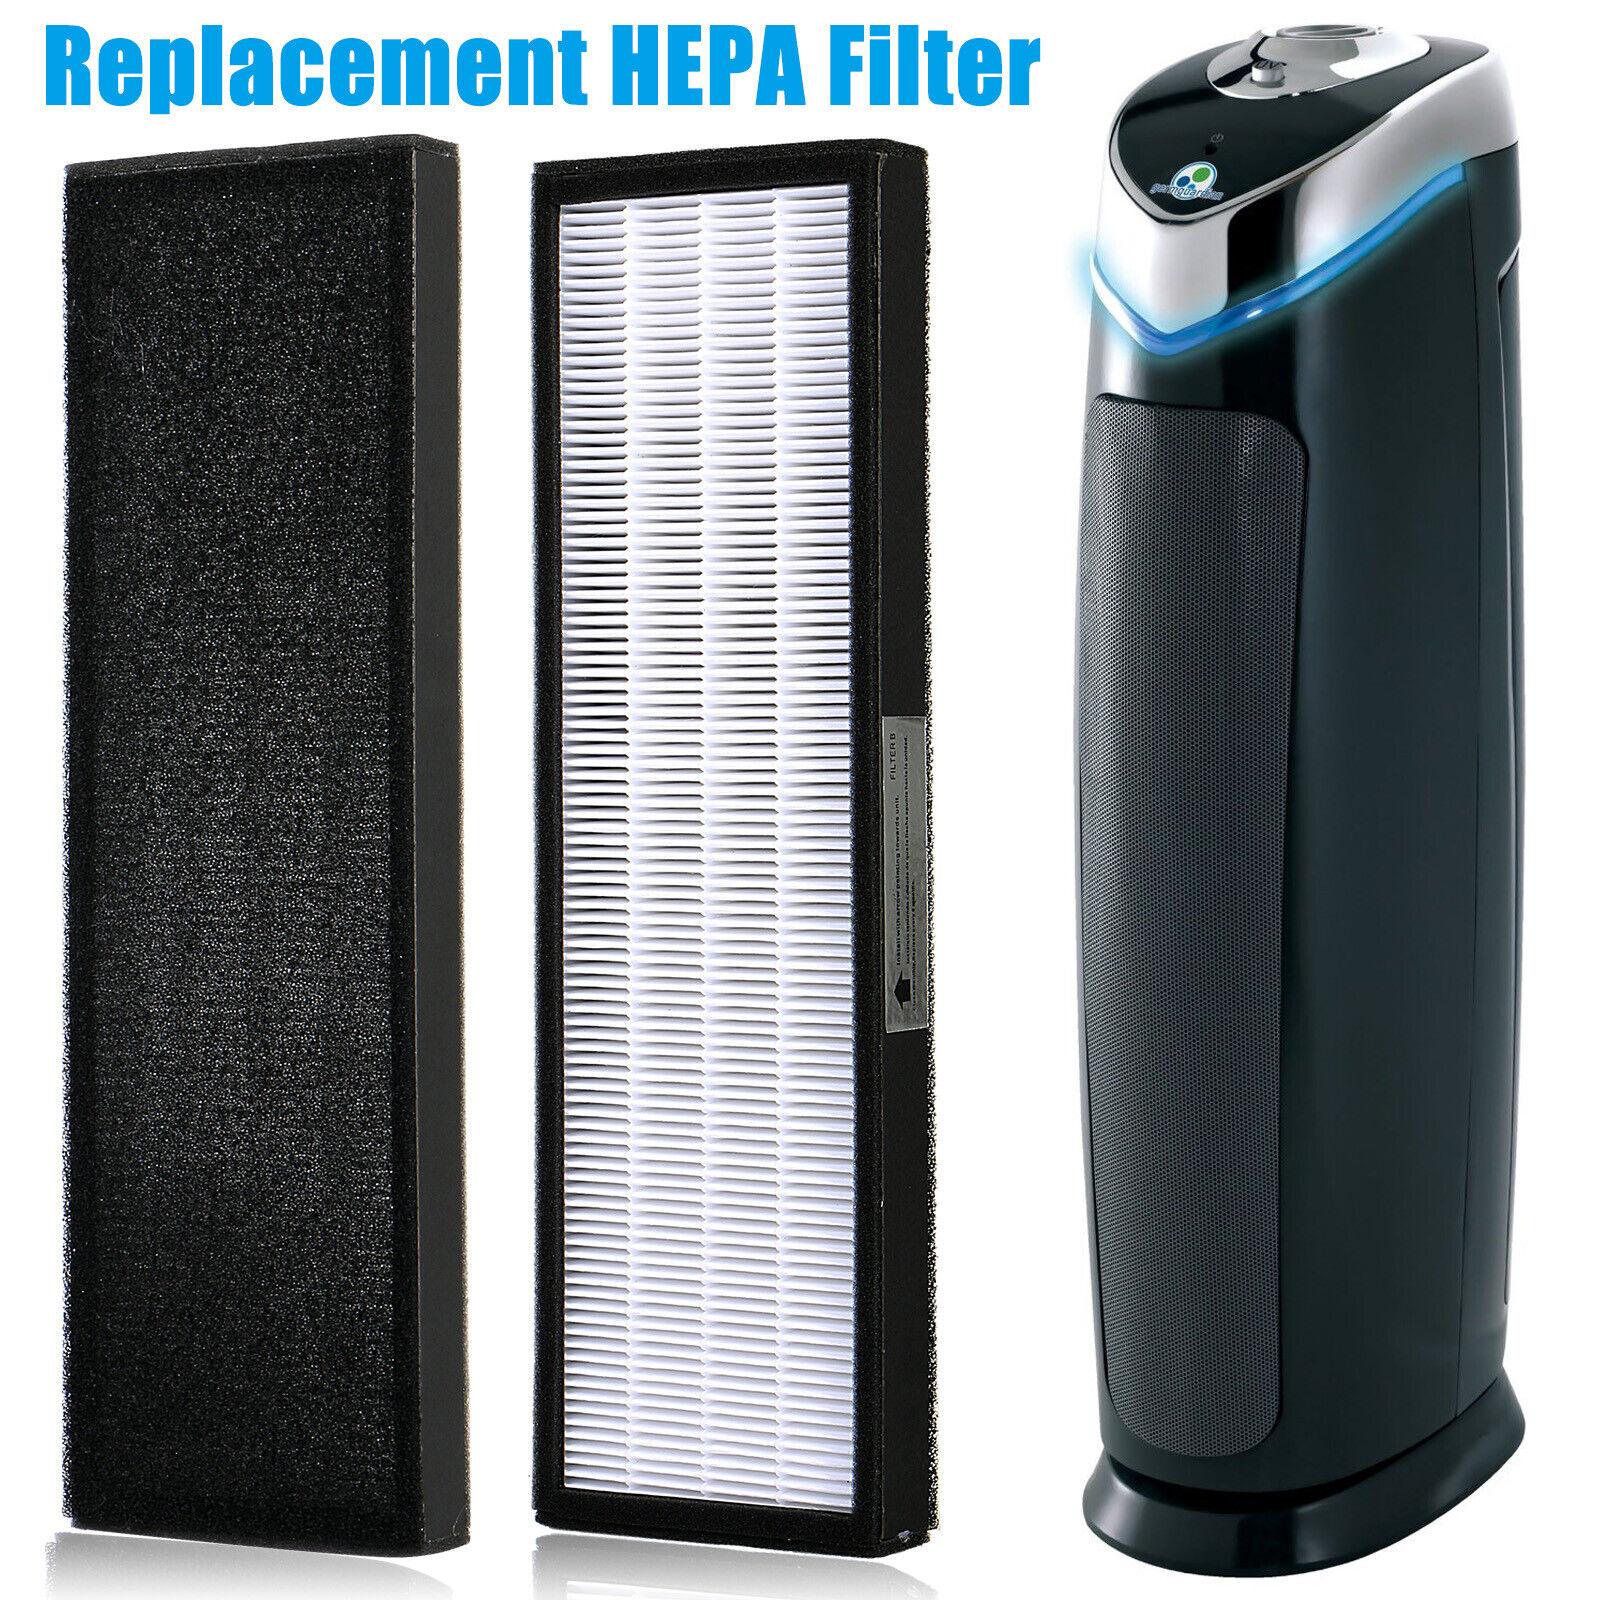 Replacement Filter for Germ Guardian FLT4825 FLT4800 Air Pur